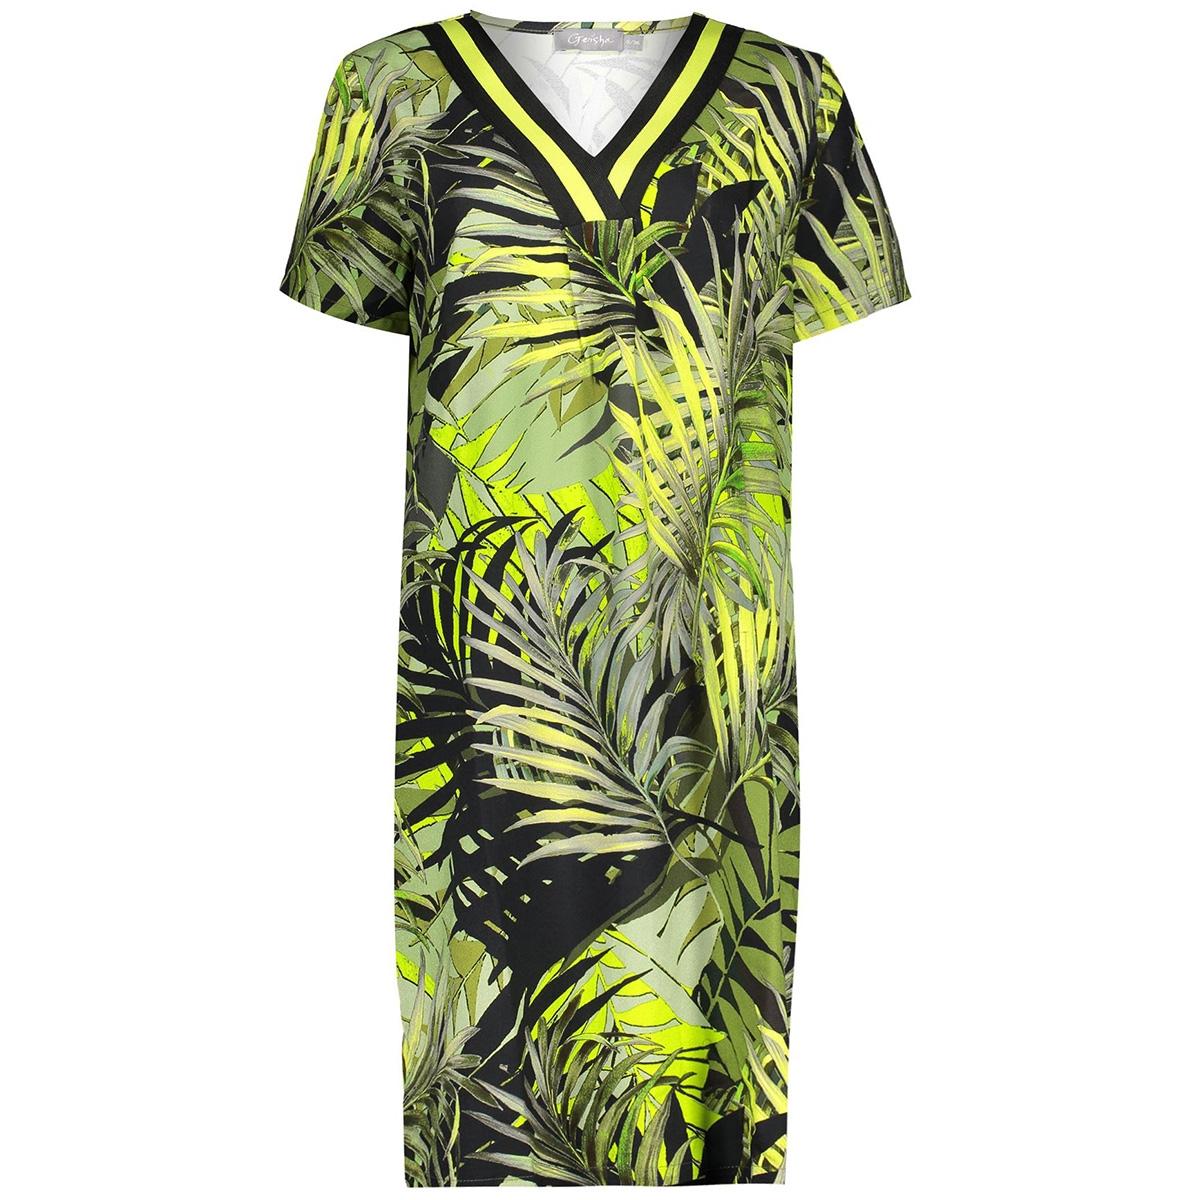 dress aop leaves v neck tape ss 07100 20 geisha jurk army/yellow combi